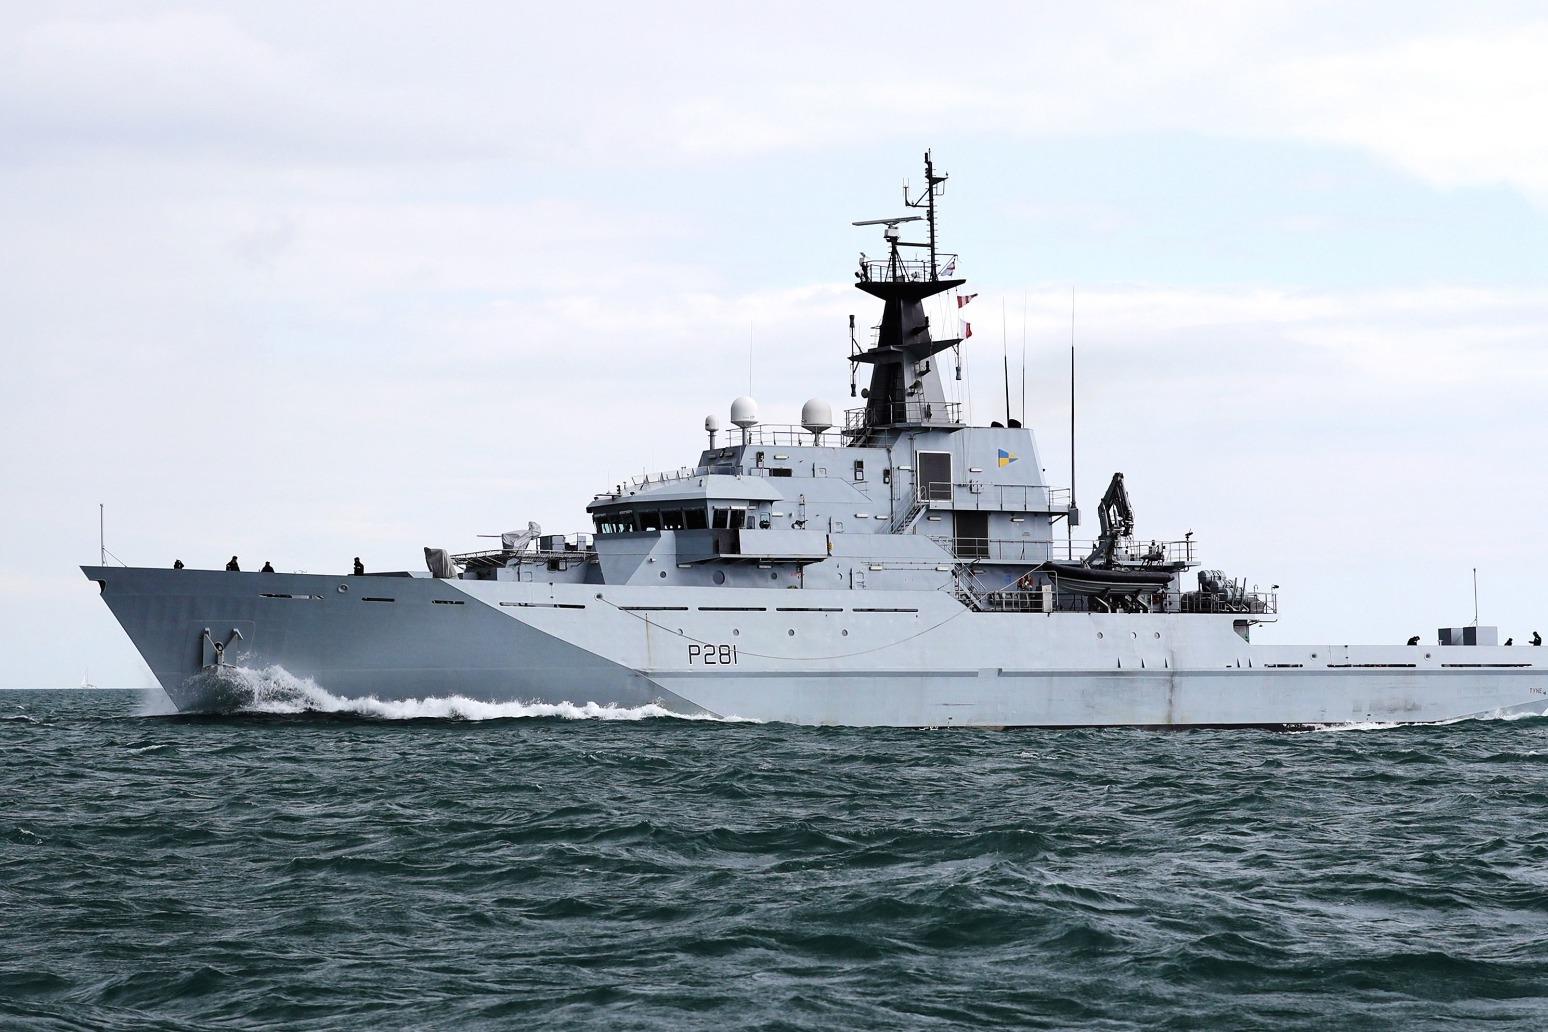 ROYAL NAVY MONITORS RUSSIAN SHIP THROUGH ENGLISH CHANNEL